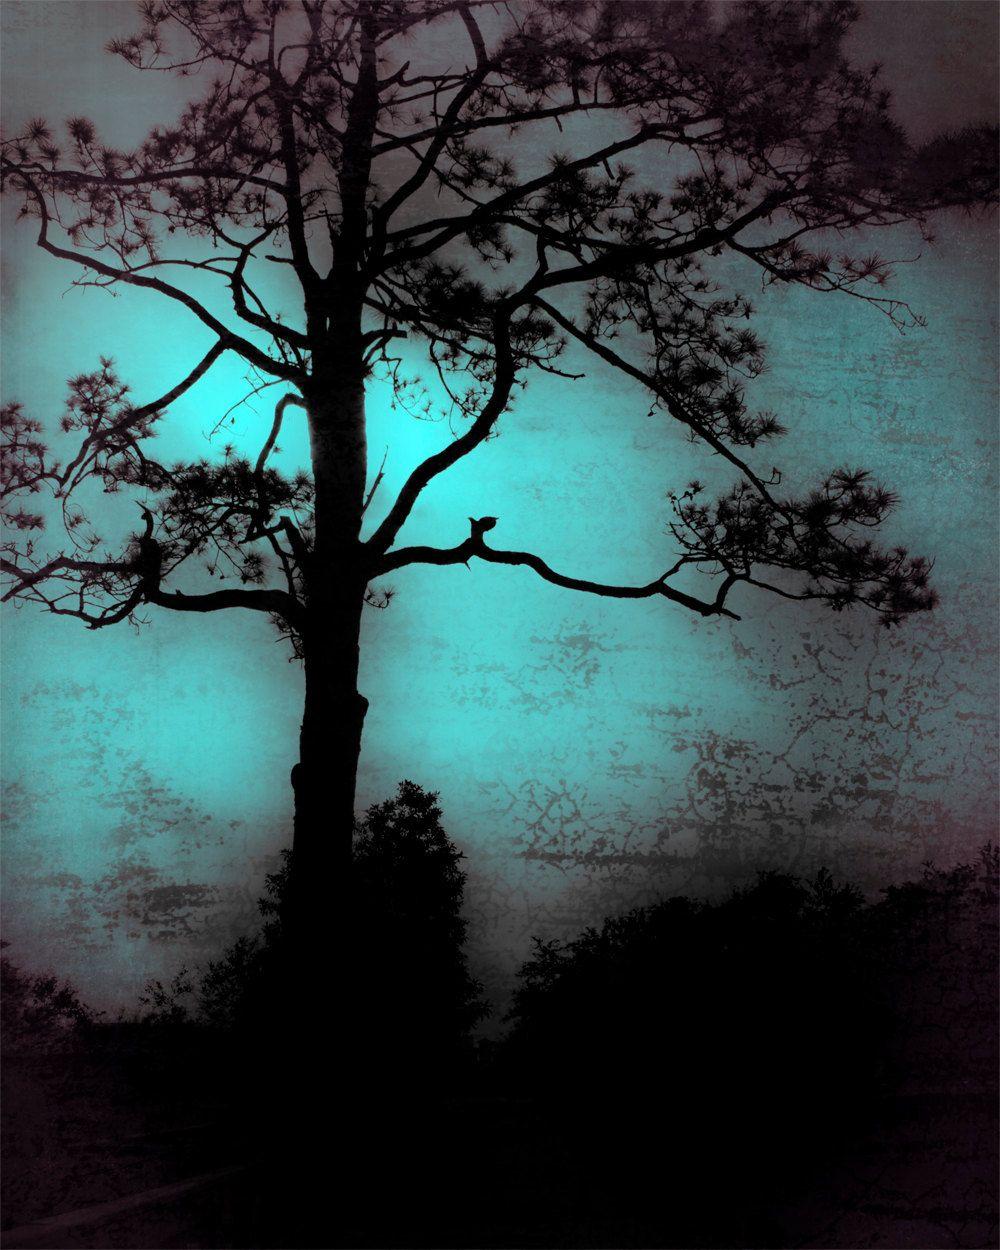 Fine Art Photography Print Blue Dark Mood Mysterious Etsy Photography Prints Art Fine Art Photography Print Fine Art